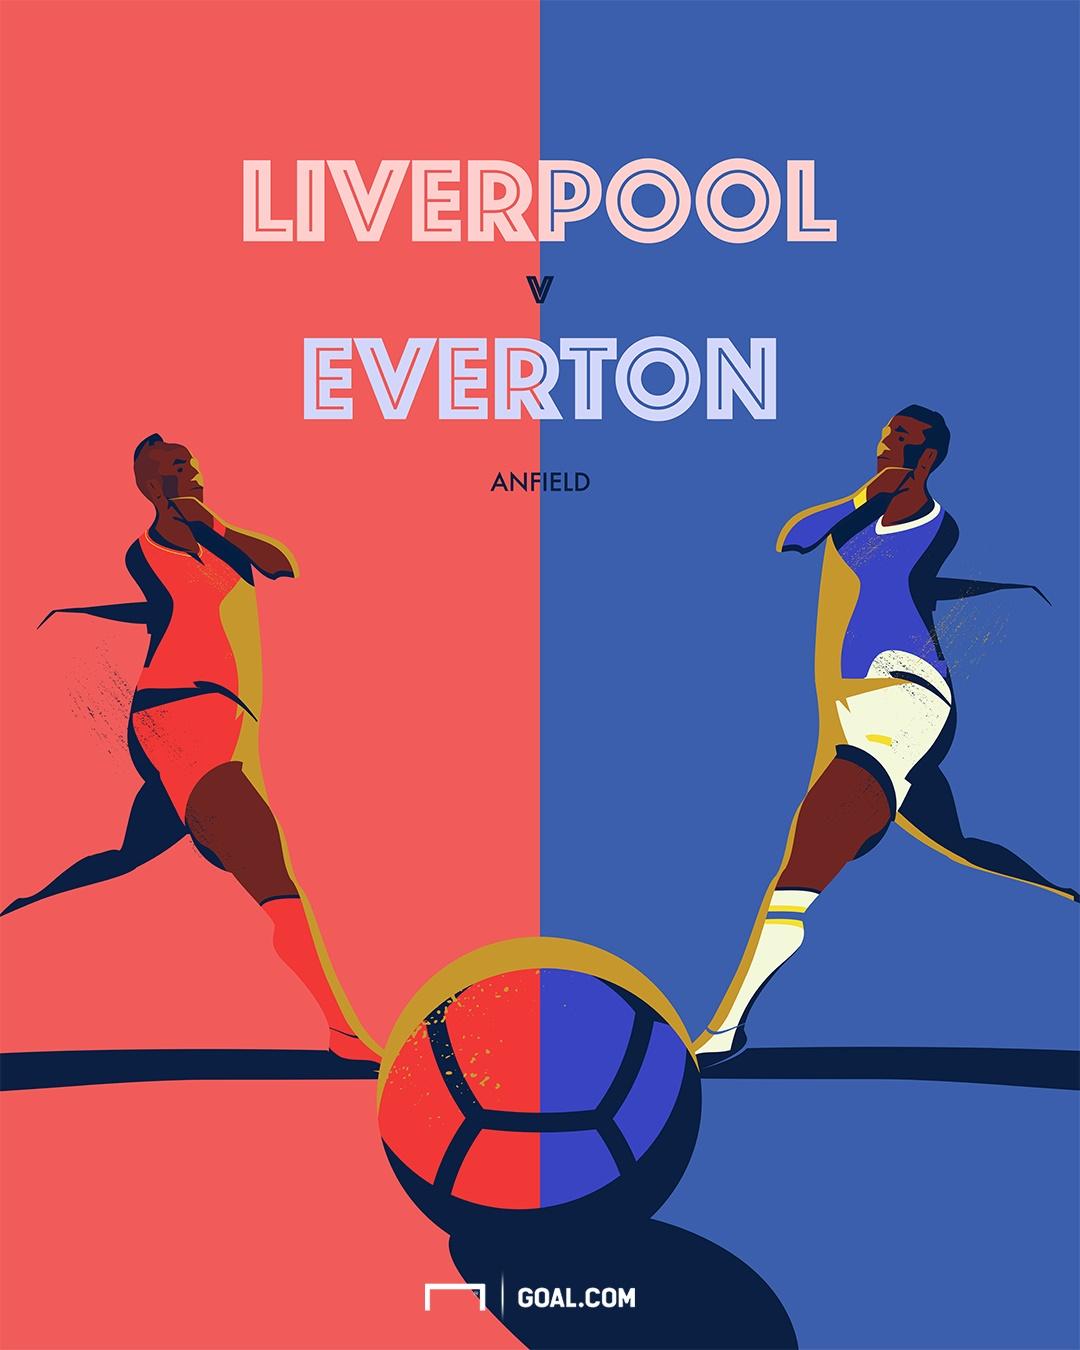 Liverpool Everton GFX